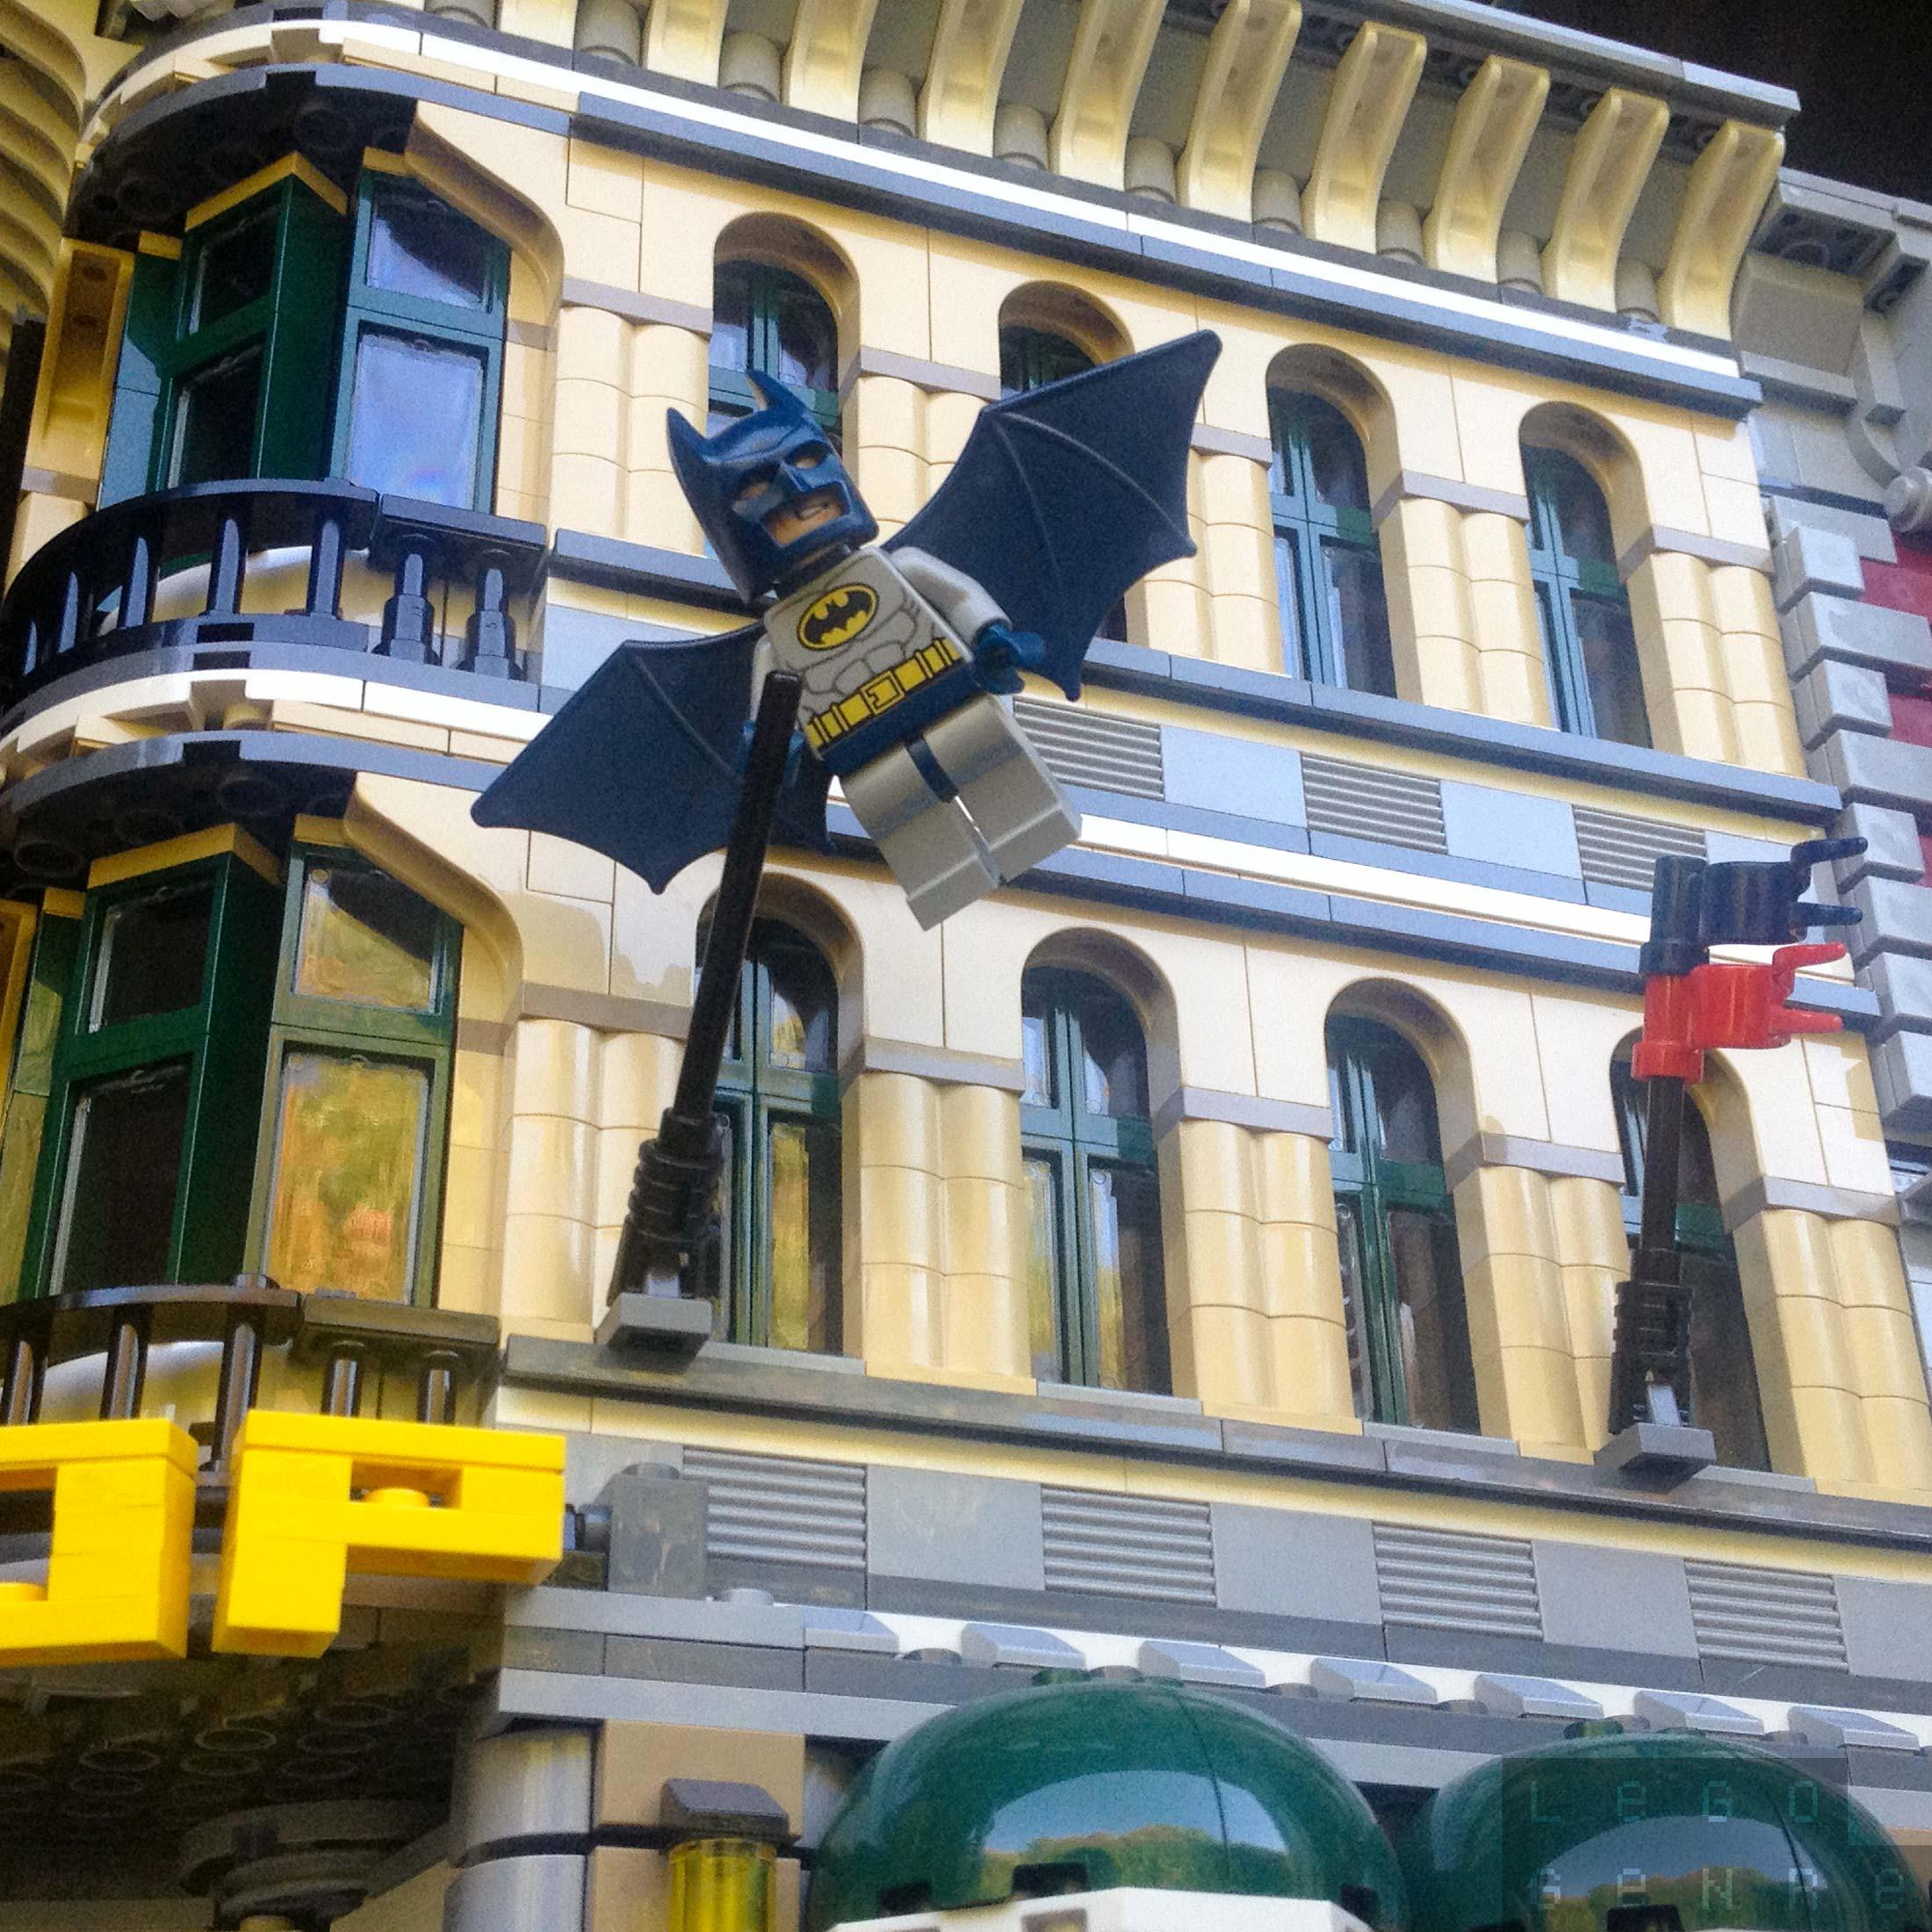 LegoGenre 00262: Batman On Patrol